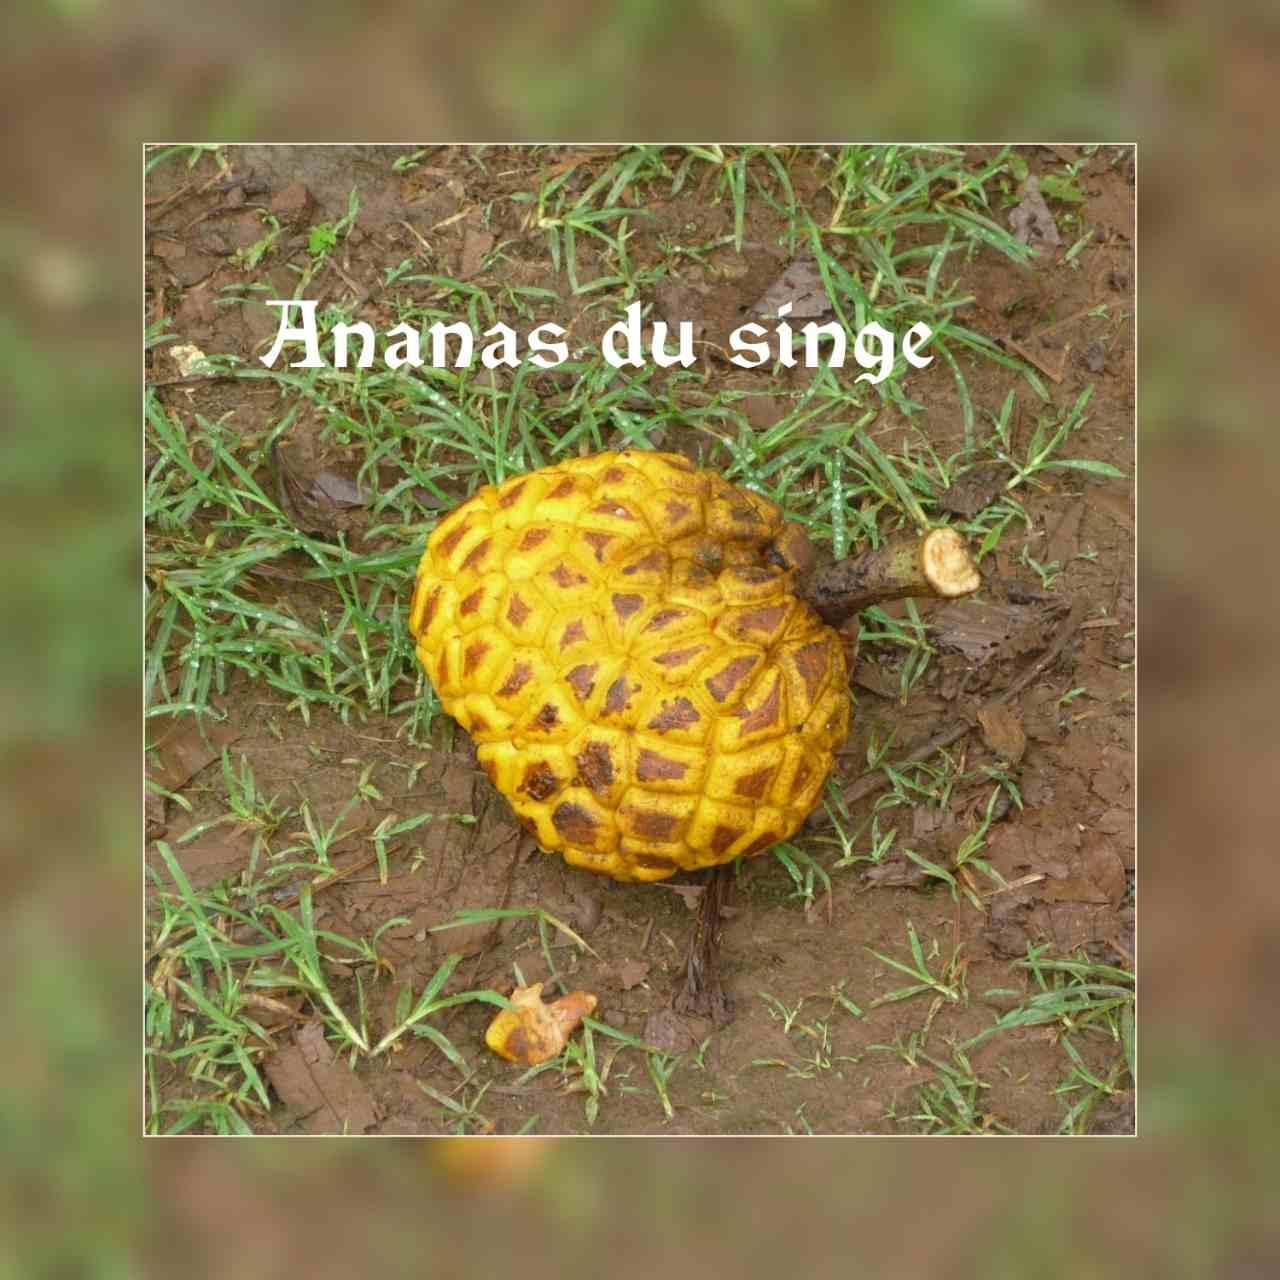 Ananas du singe